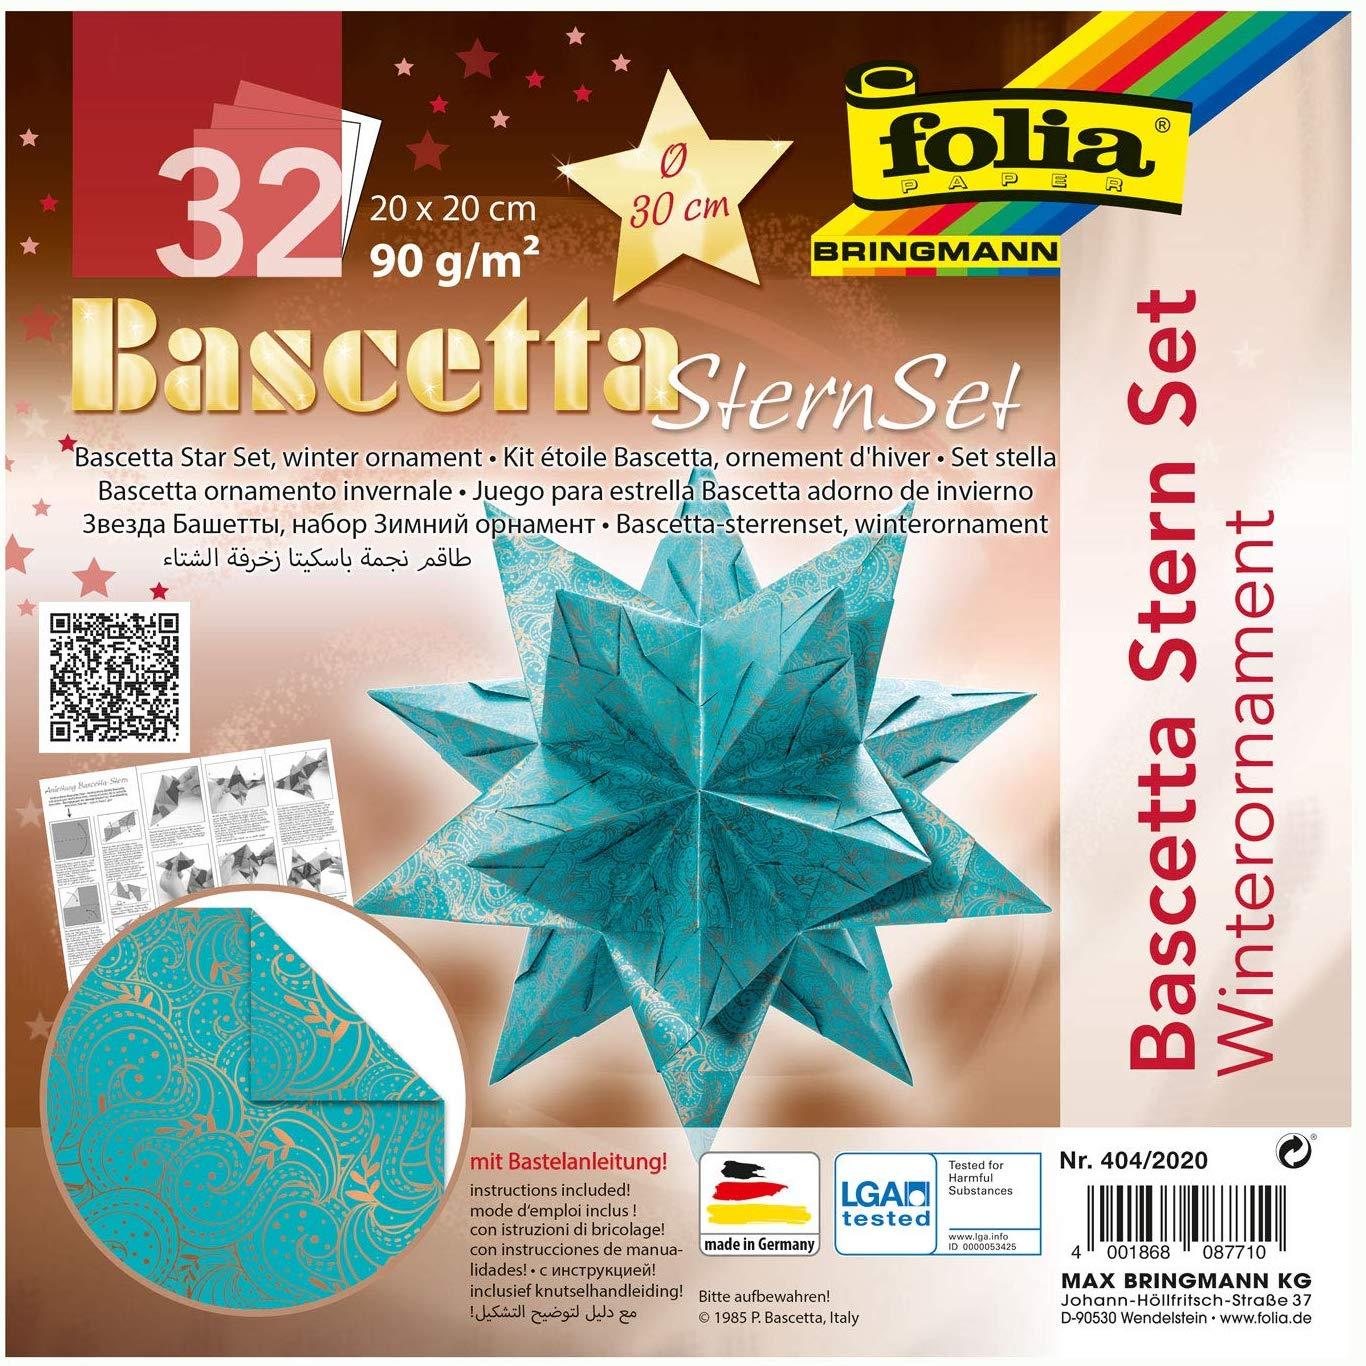 folia 404/2020 - Bastelset Bascetta Stern Winterornament türkis/kupfer, 32 Blatt, 20 x 20 cm, fertig